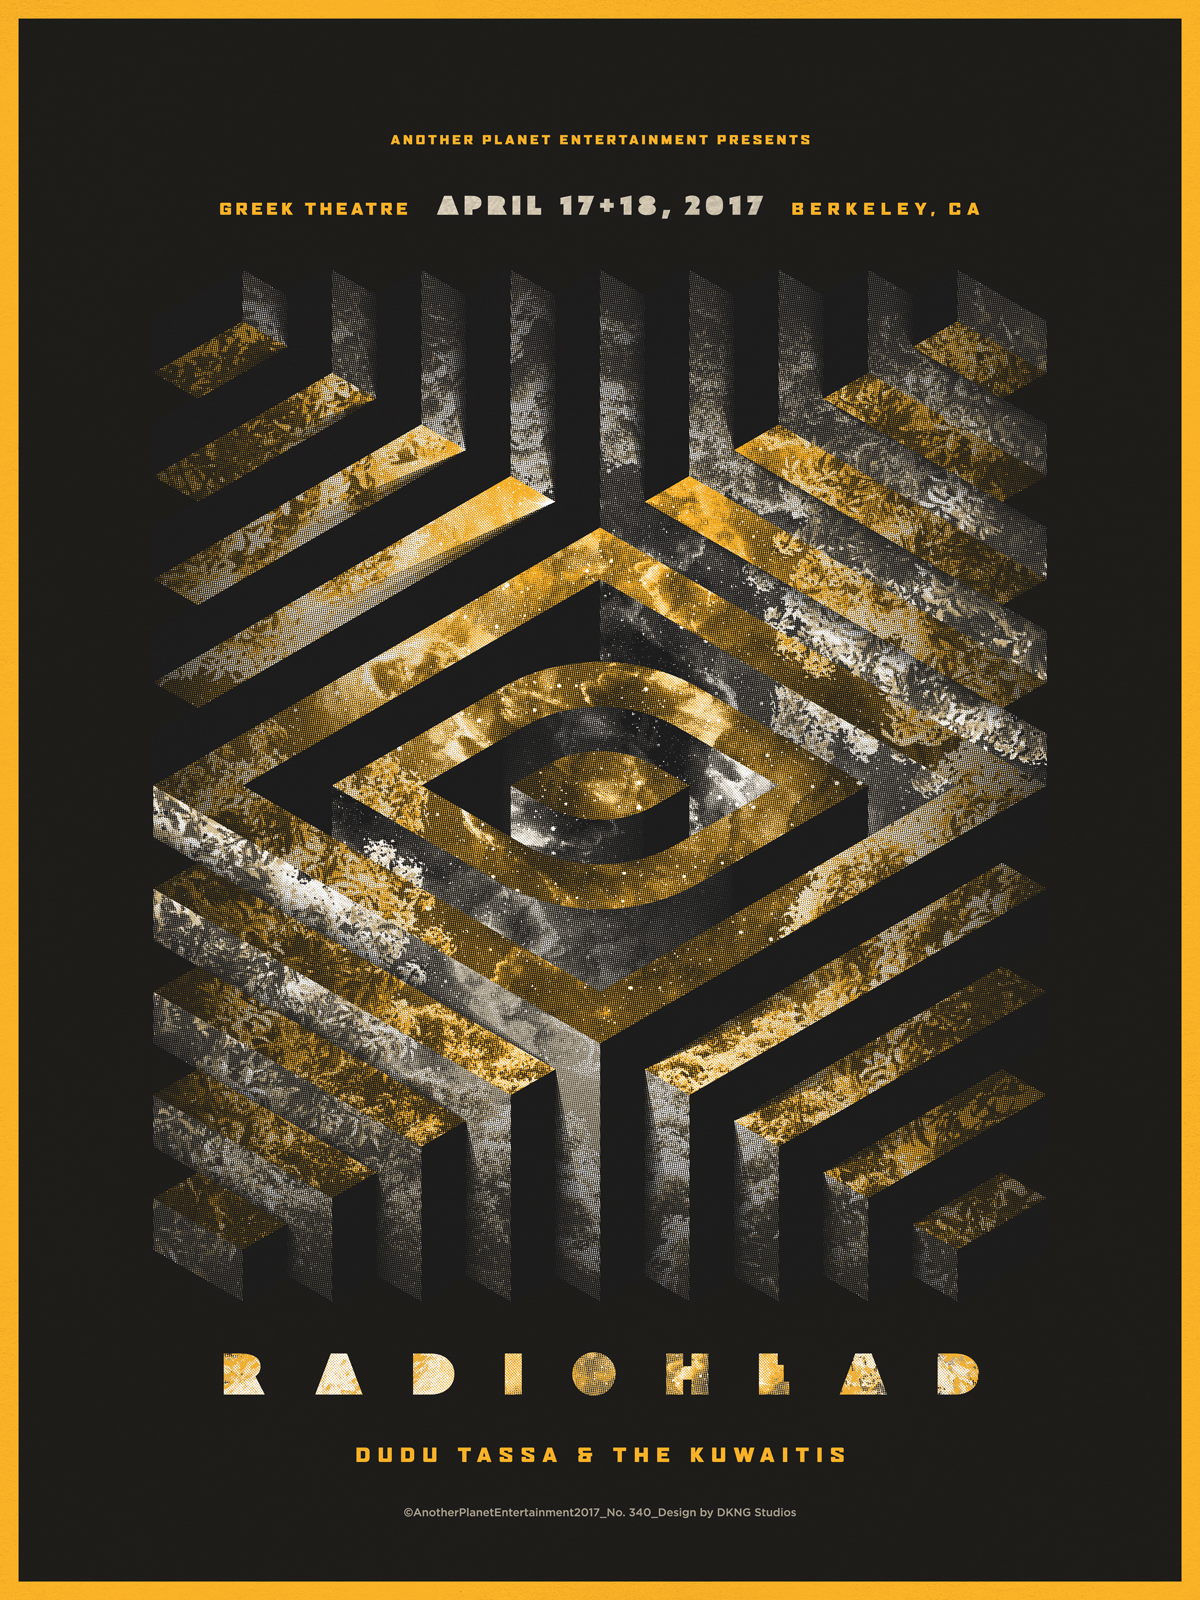 radiohead_yellow.jpg